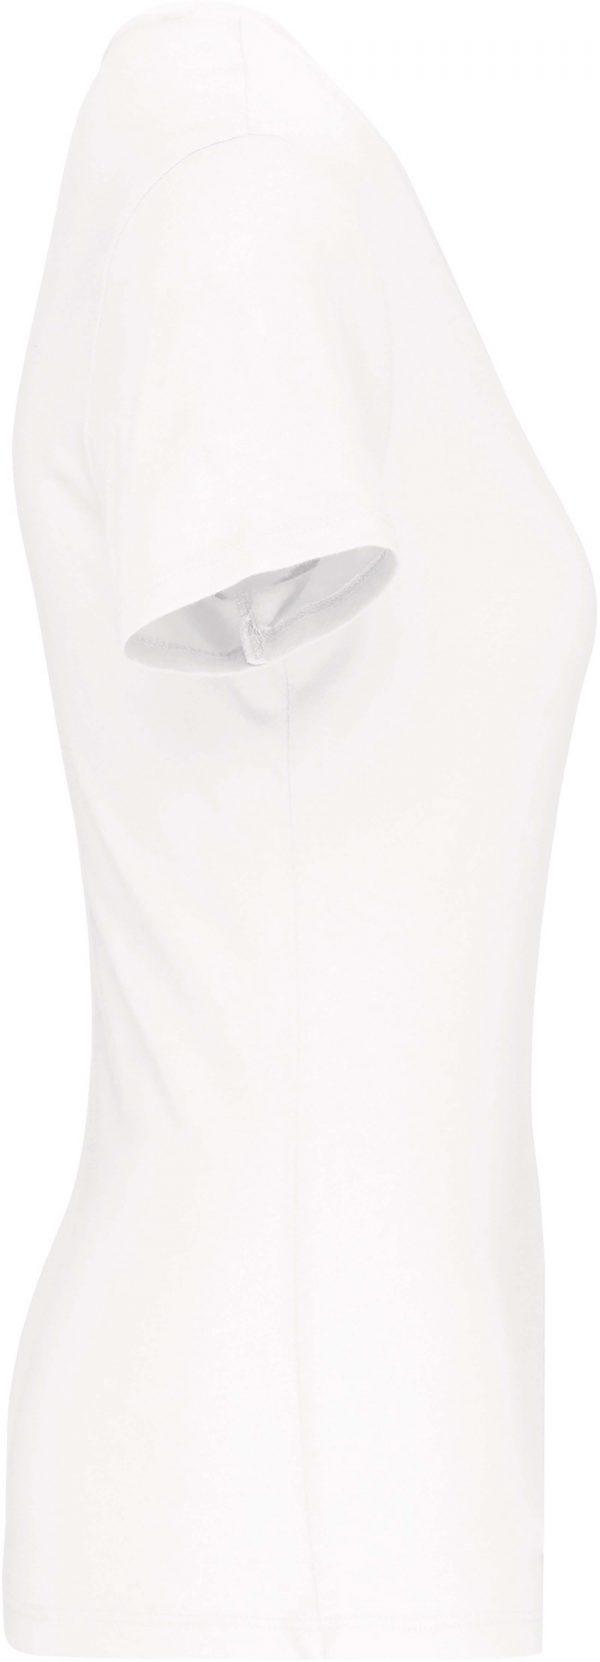 Tee Shirt Blanc Col V Femme 2 | Soirée Blanche